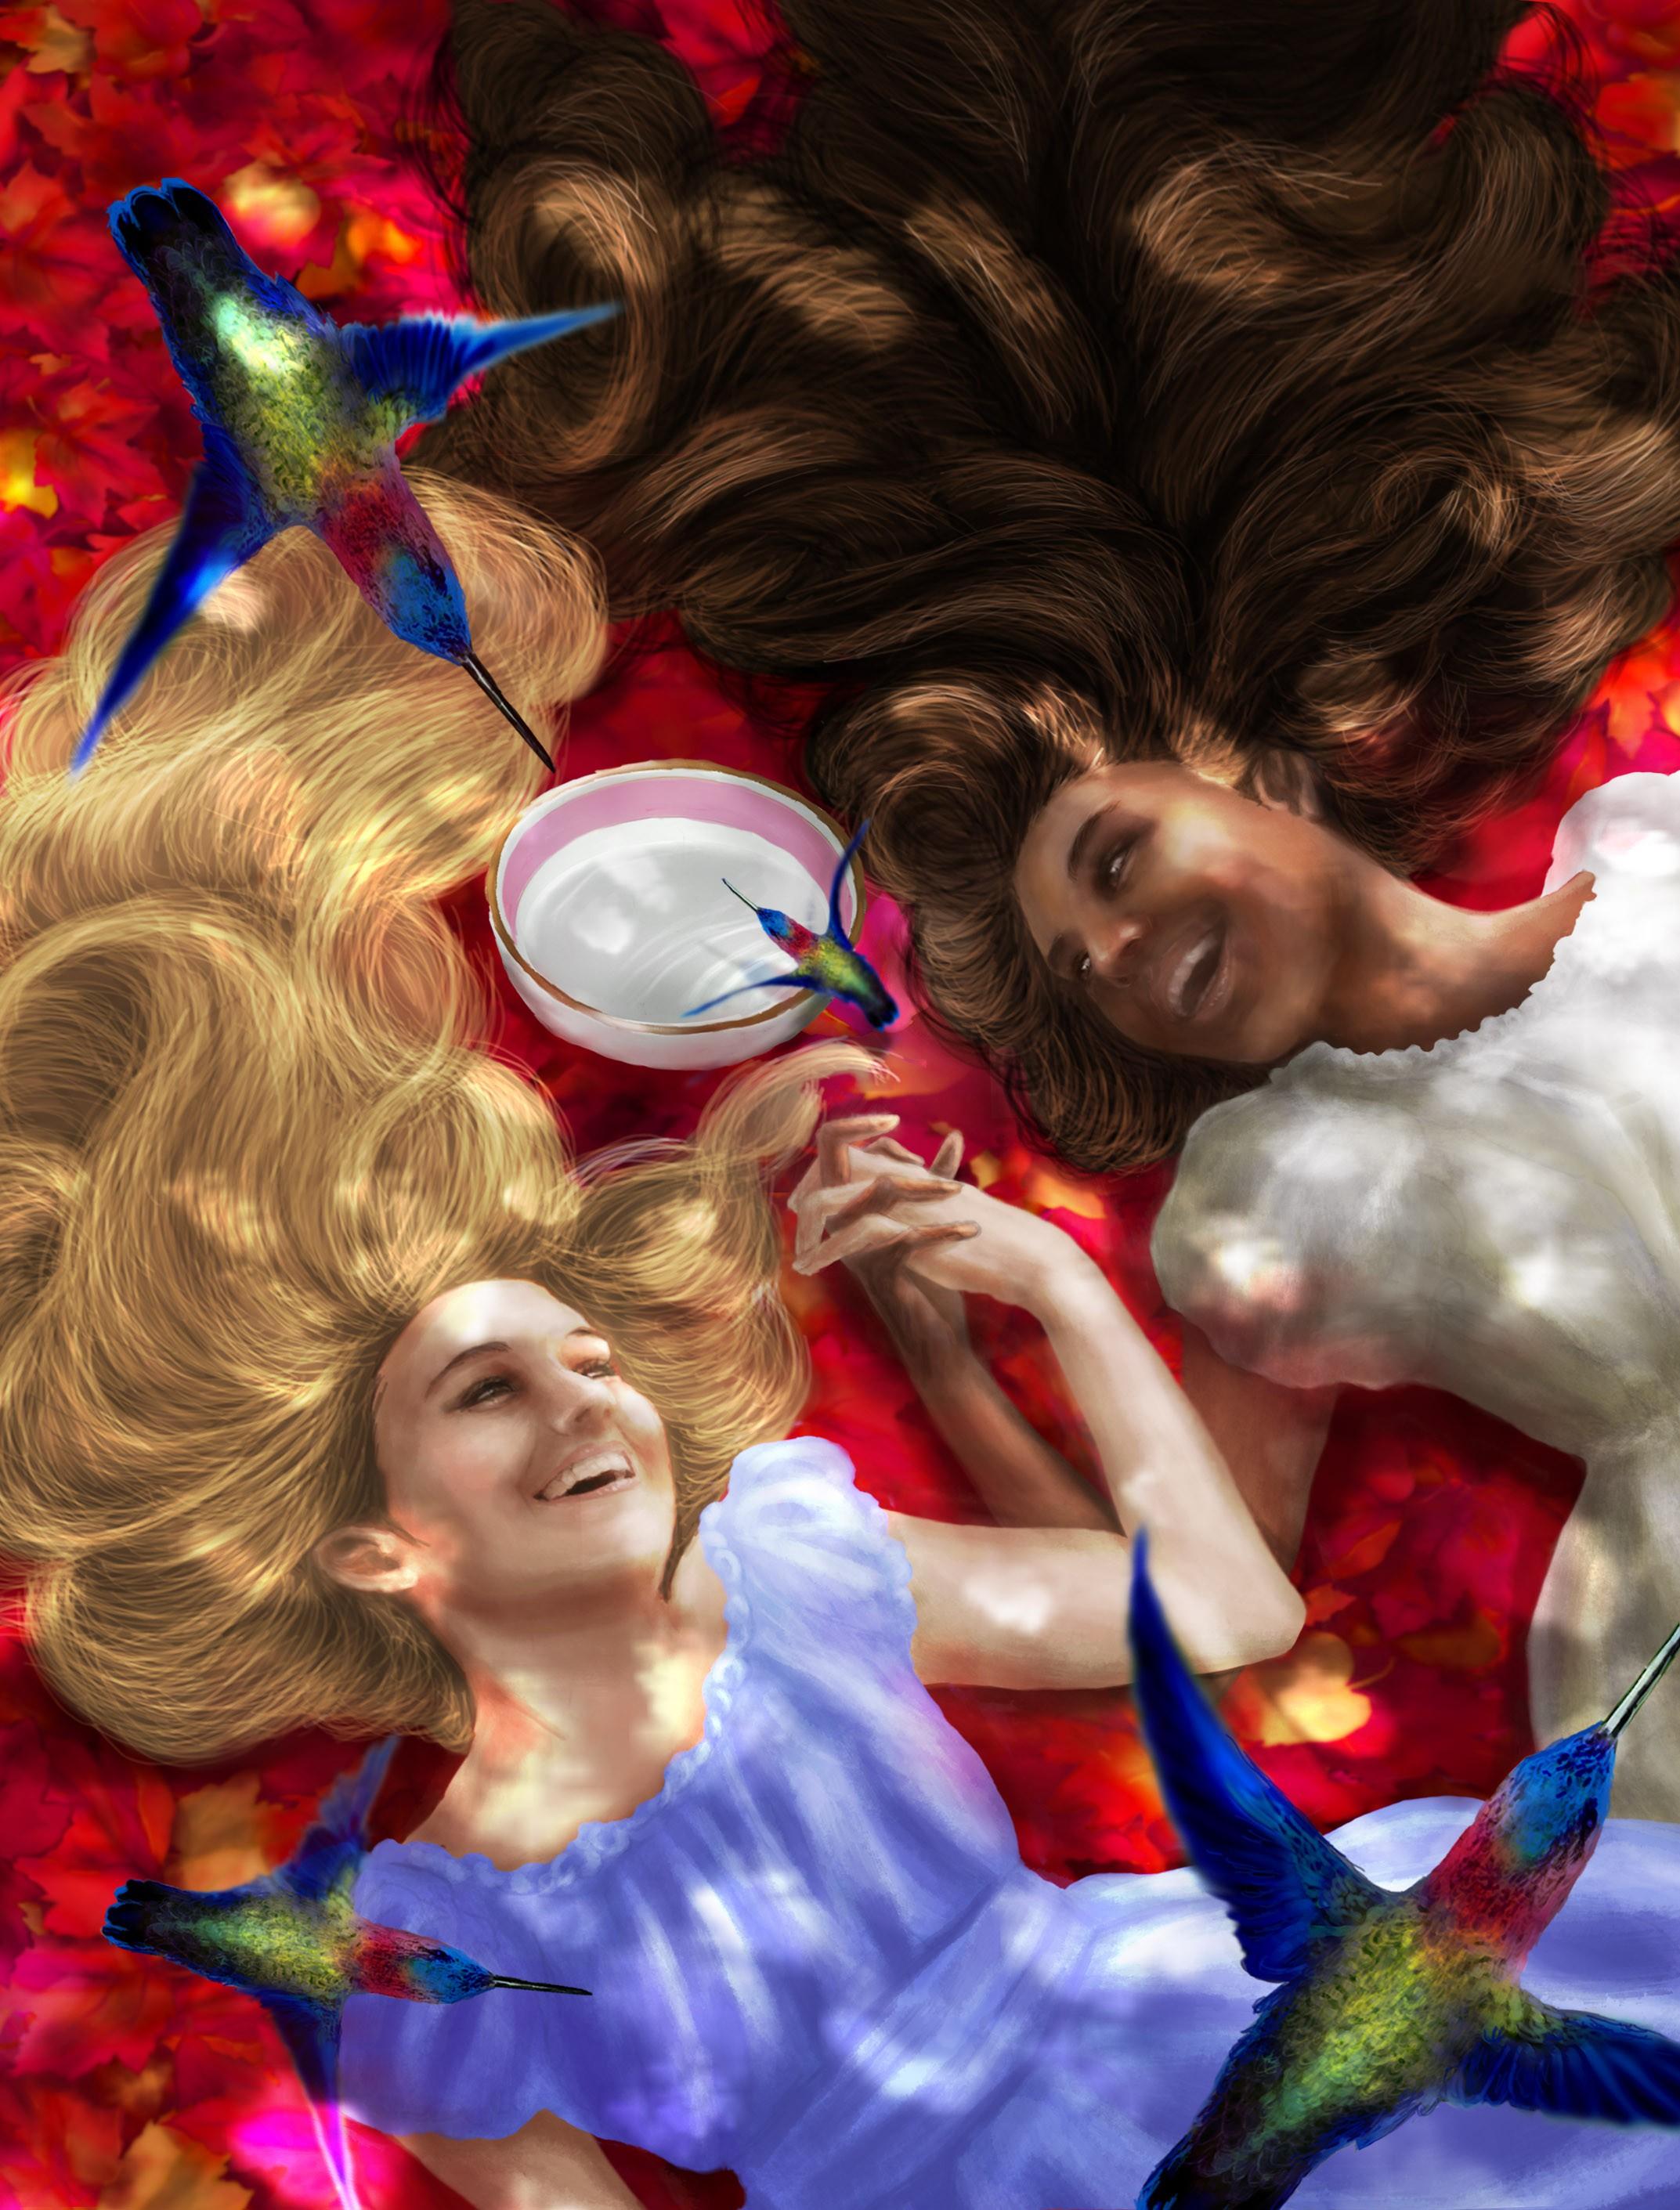 Design A Book Cover for Historical Middle Grade Novel for Girls - Antebellum South